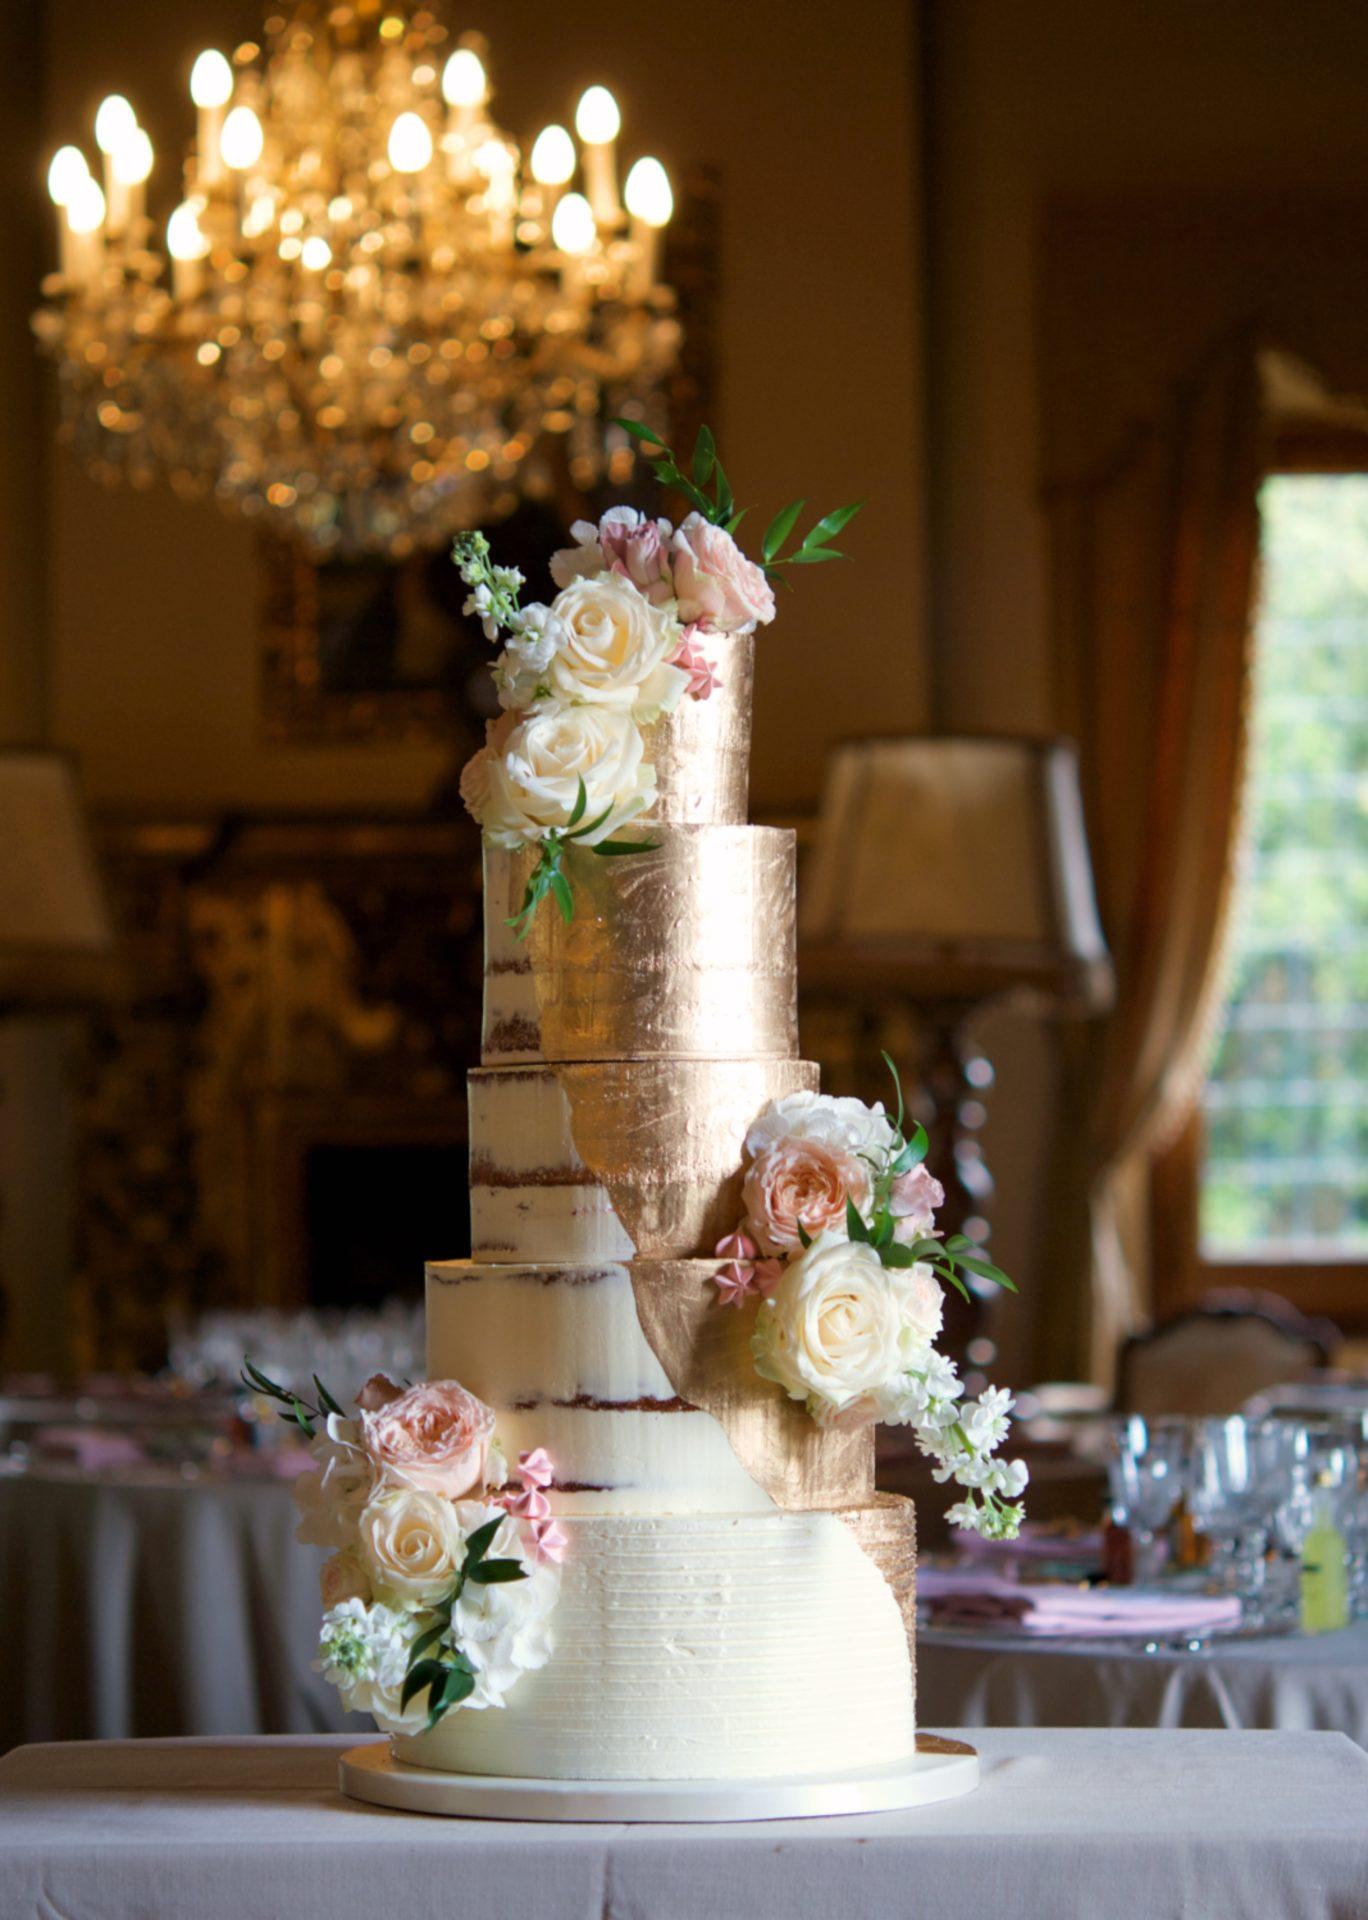 Contacta con Mericakes - Cake Designer